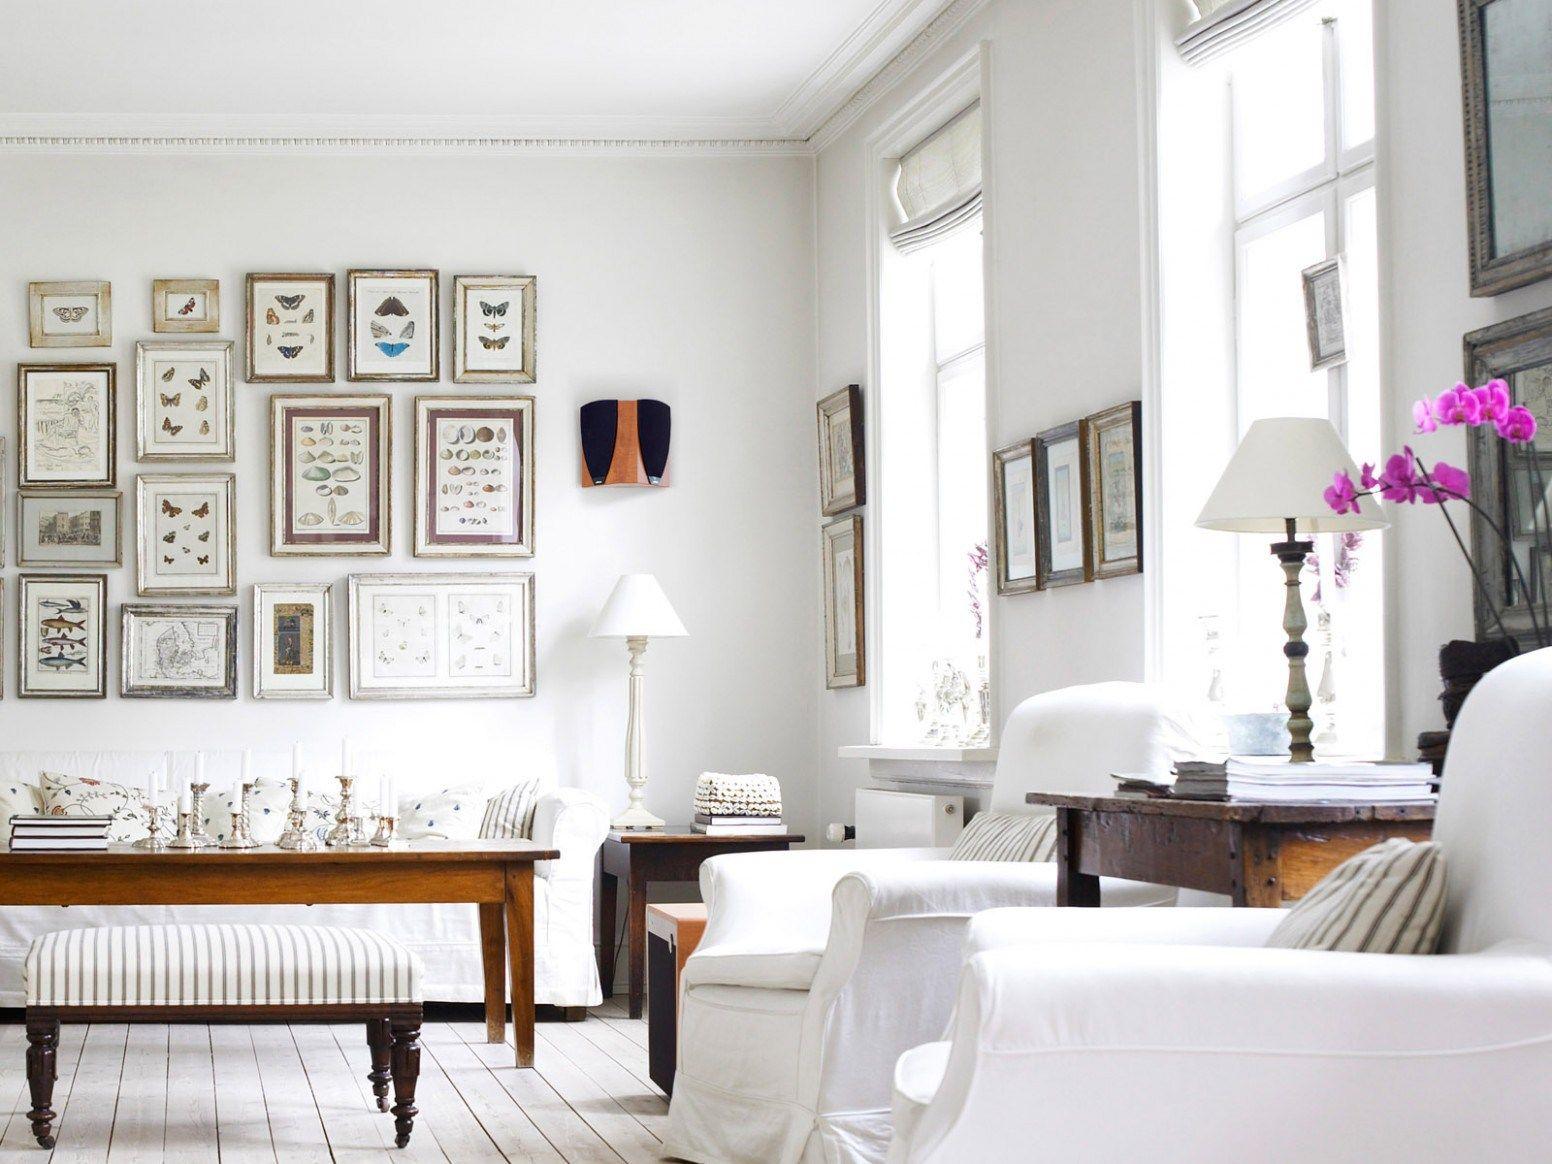 Home interior design gurgaon pin by interior design on interiordesgn  pinterest  home interior